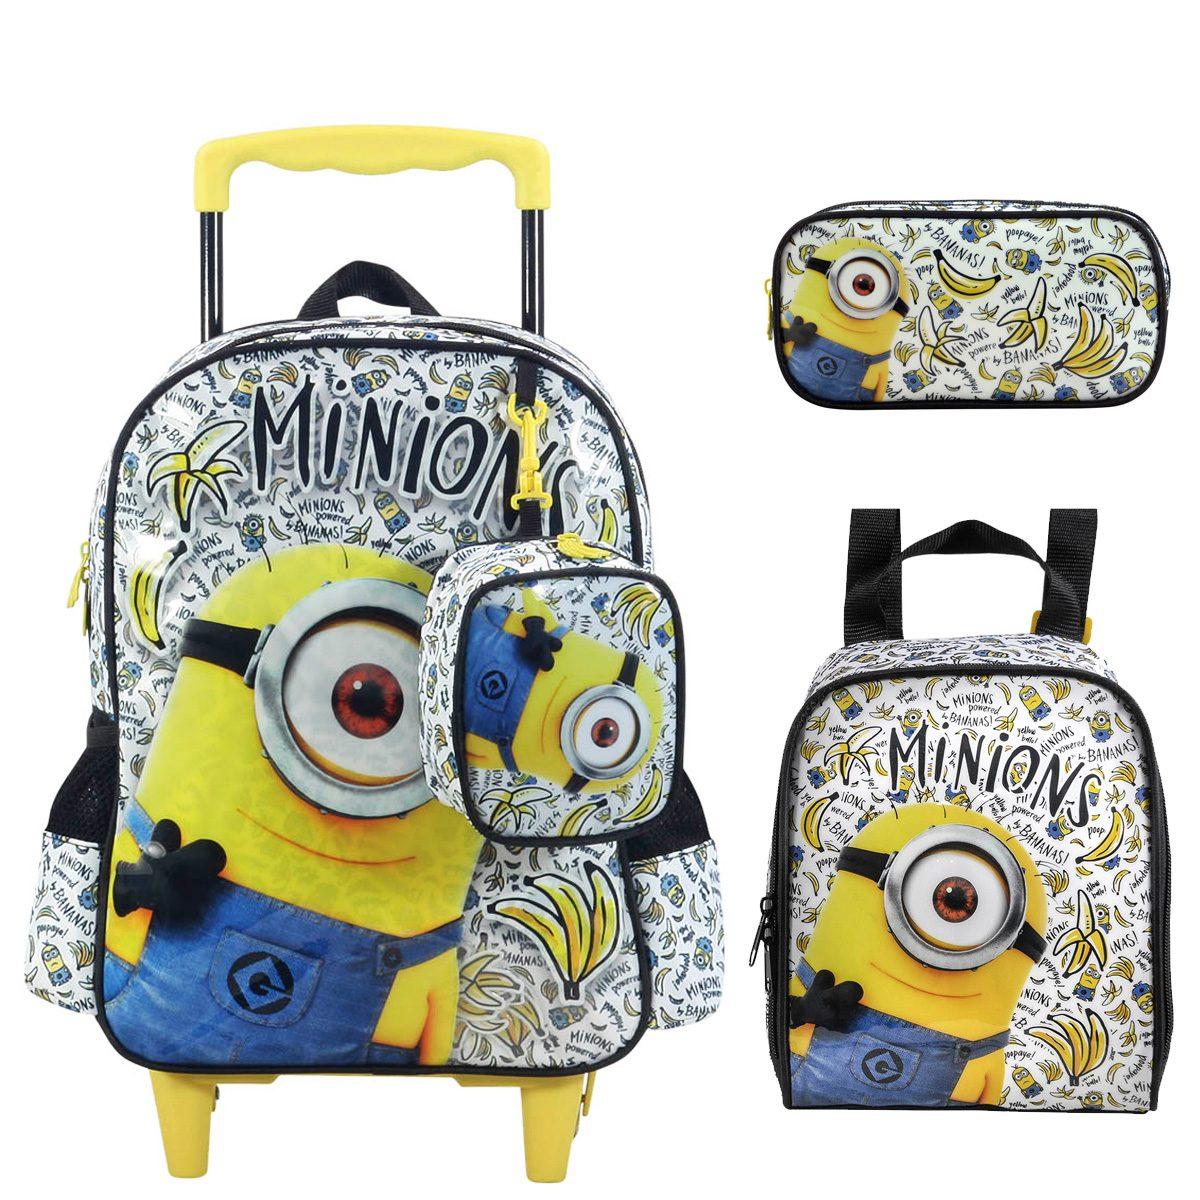 8e66feca64 kit escolar mochila rodas lancheira estojo minions bananas. Carregando zoom.